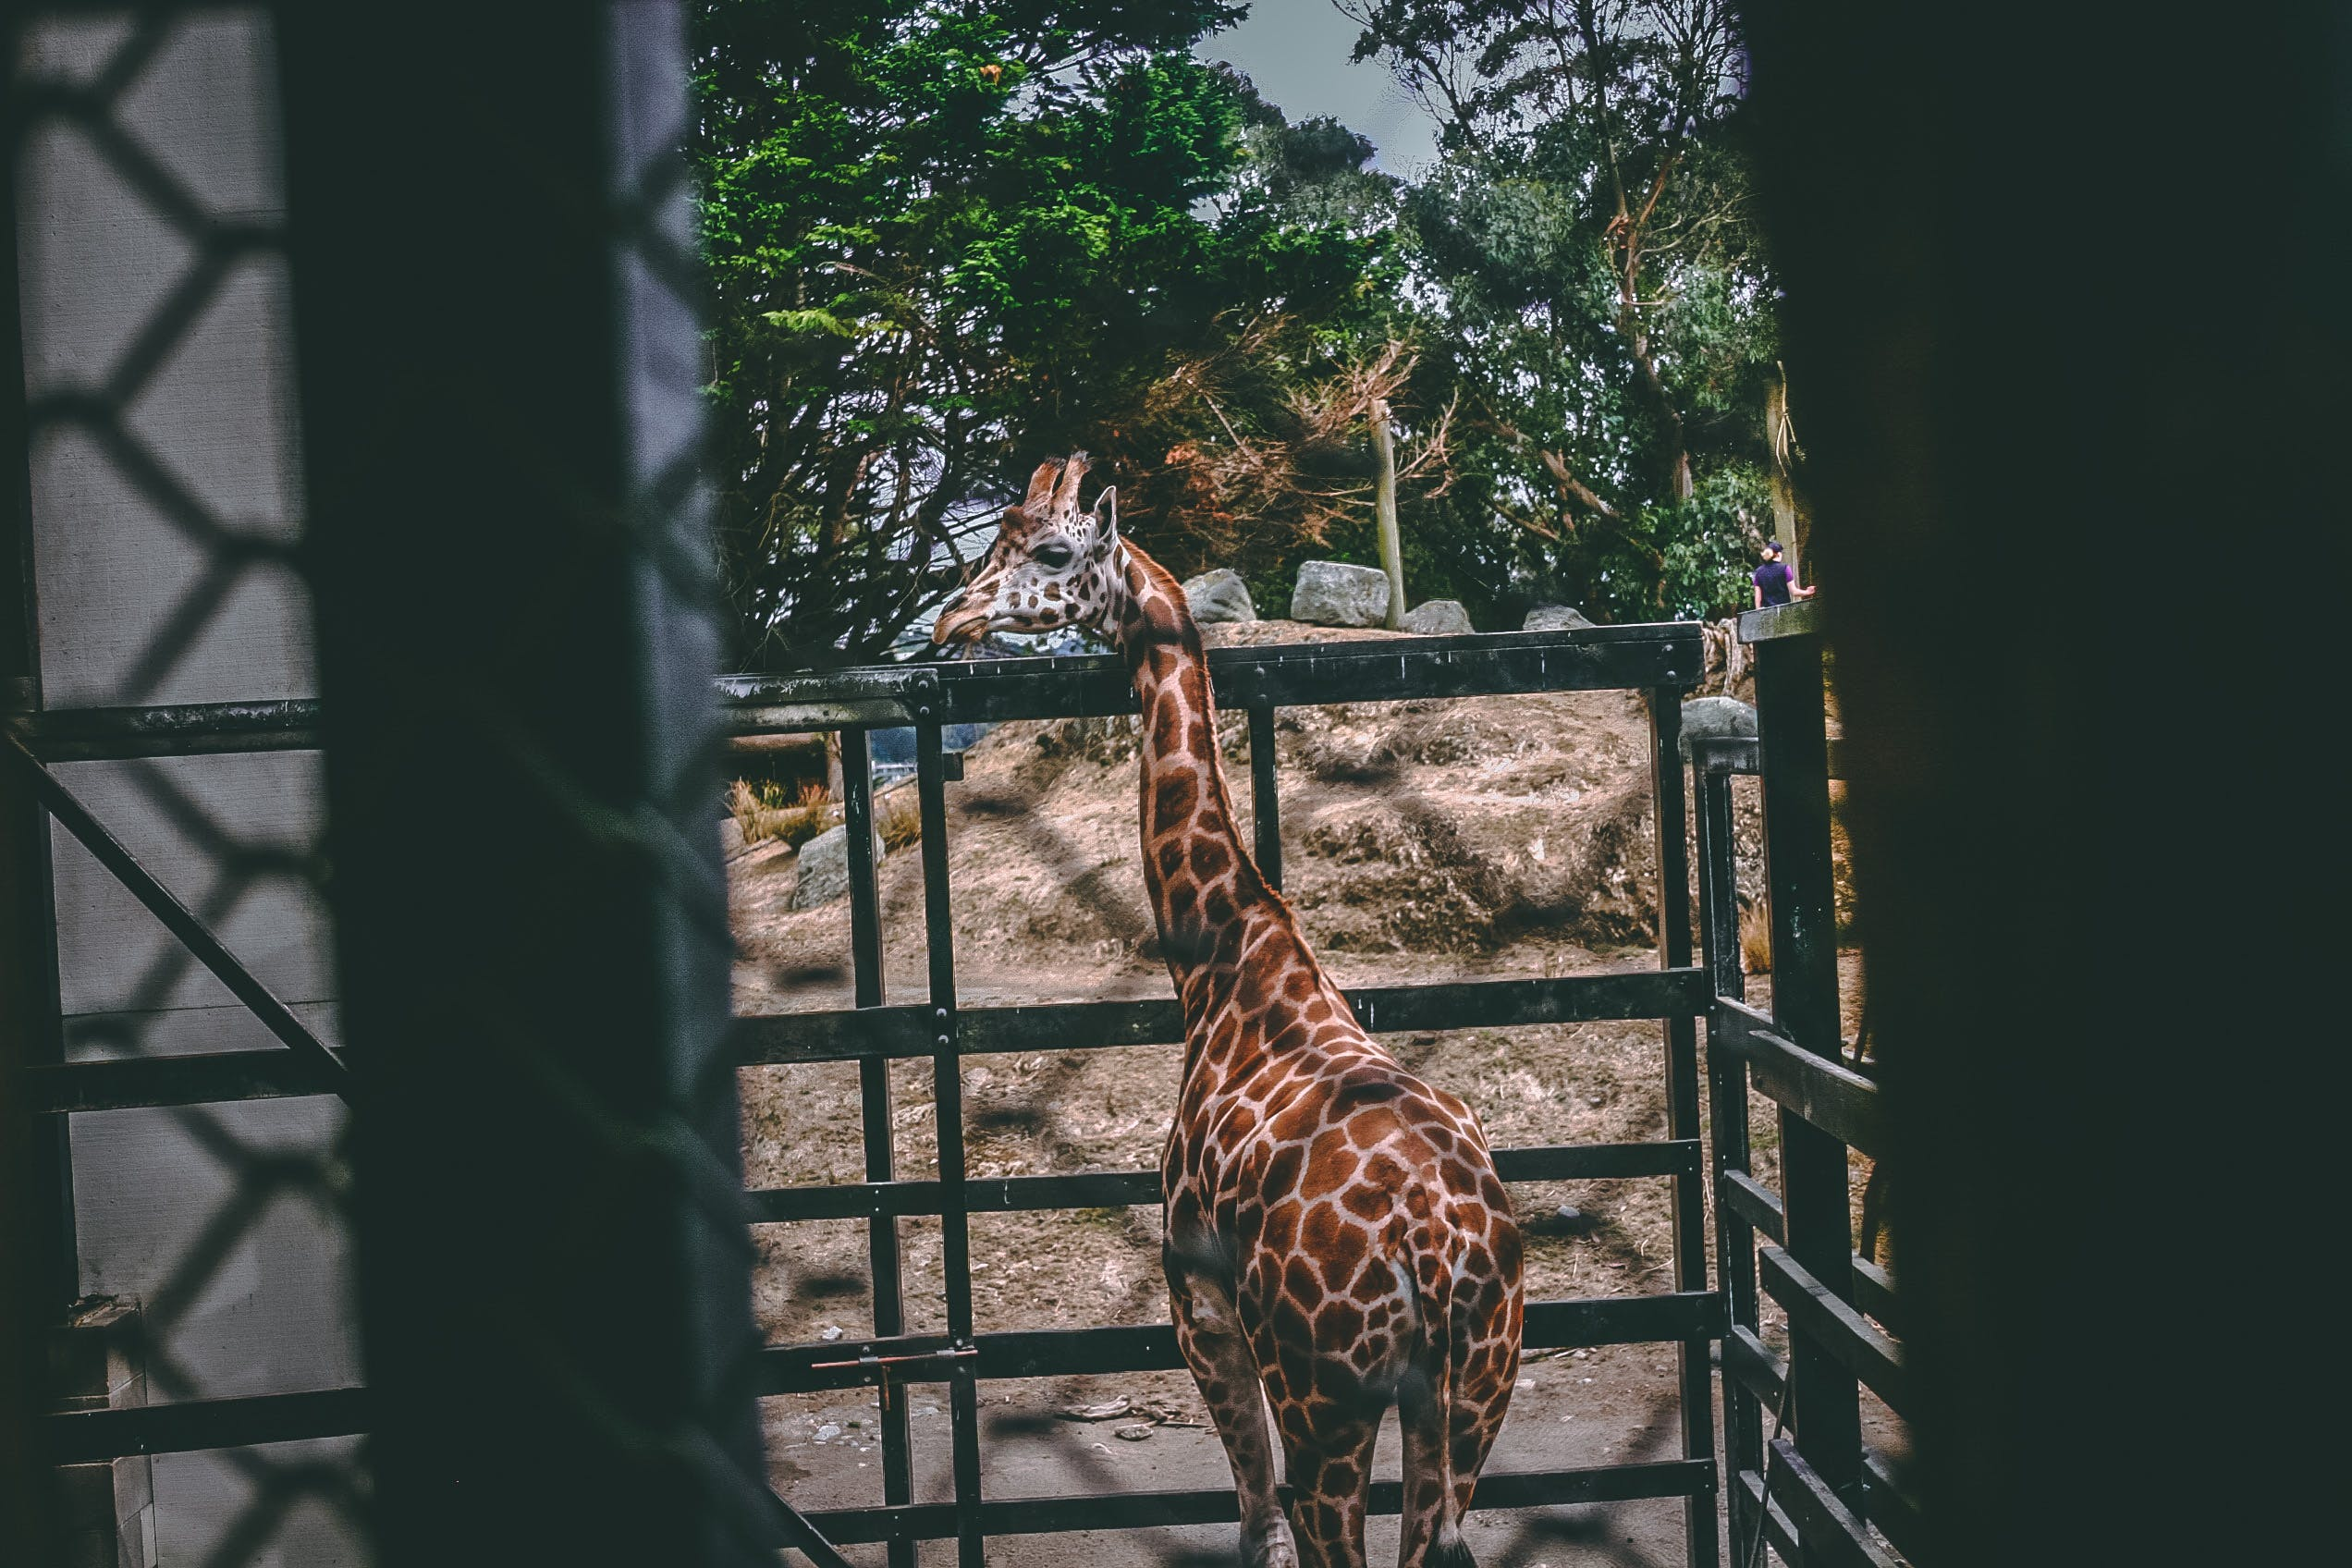 Giraffe on Black Metal Cage